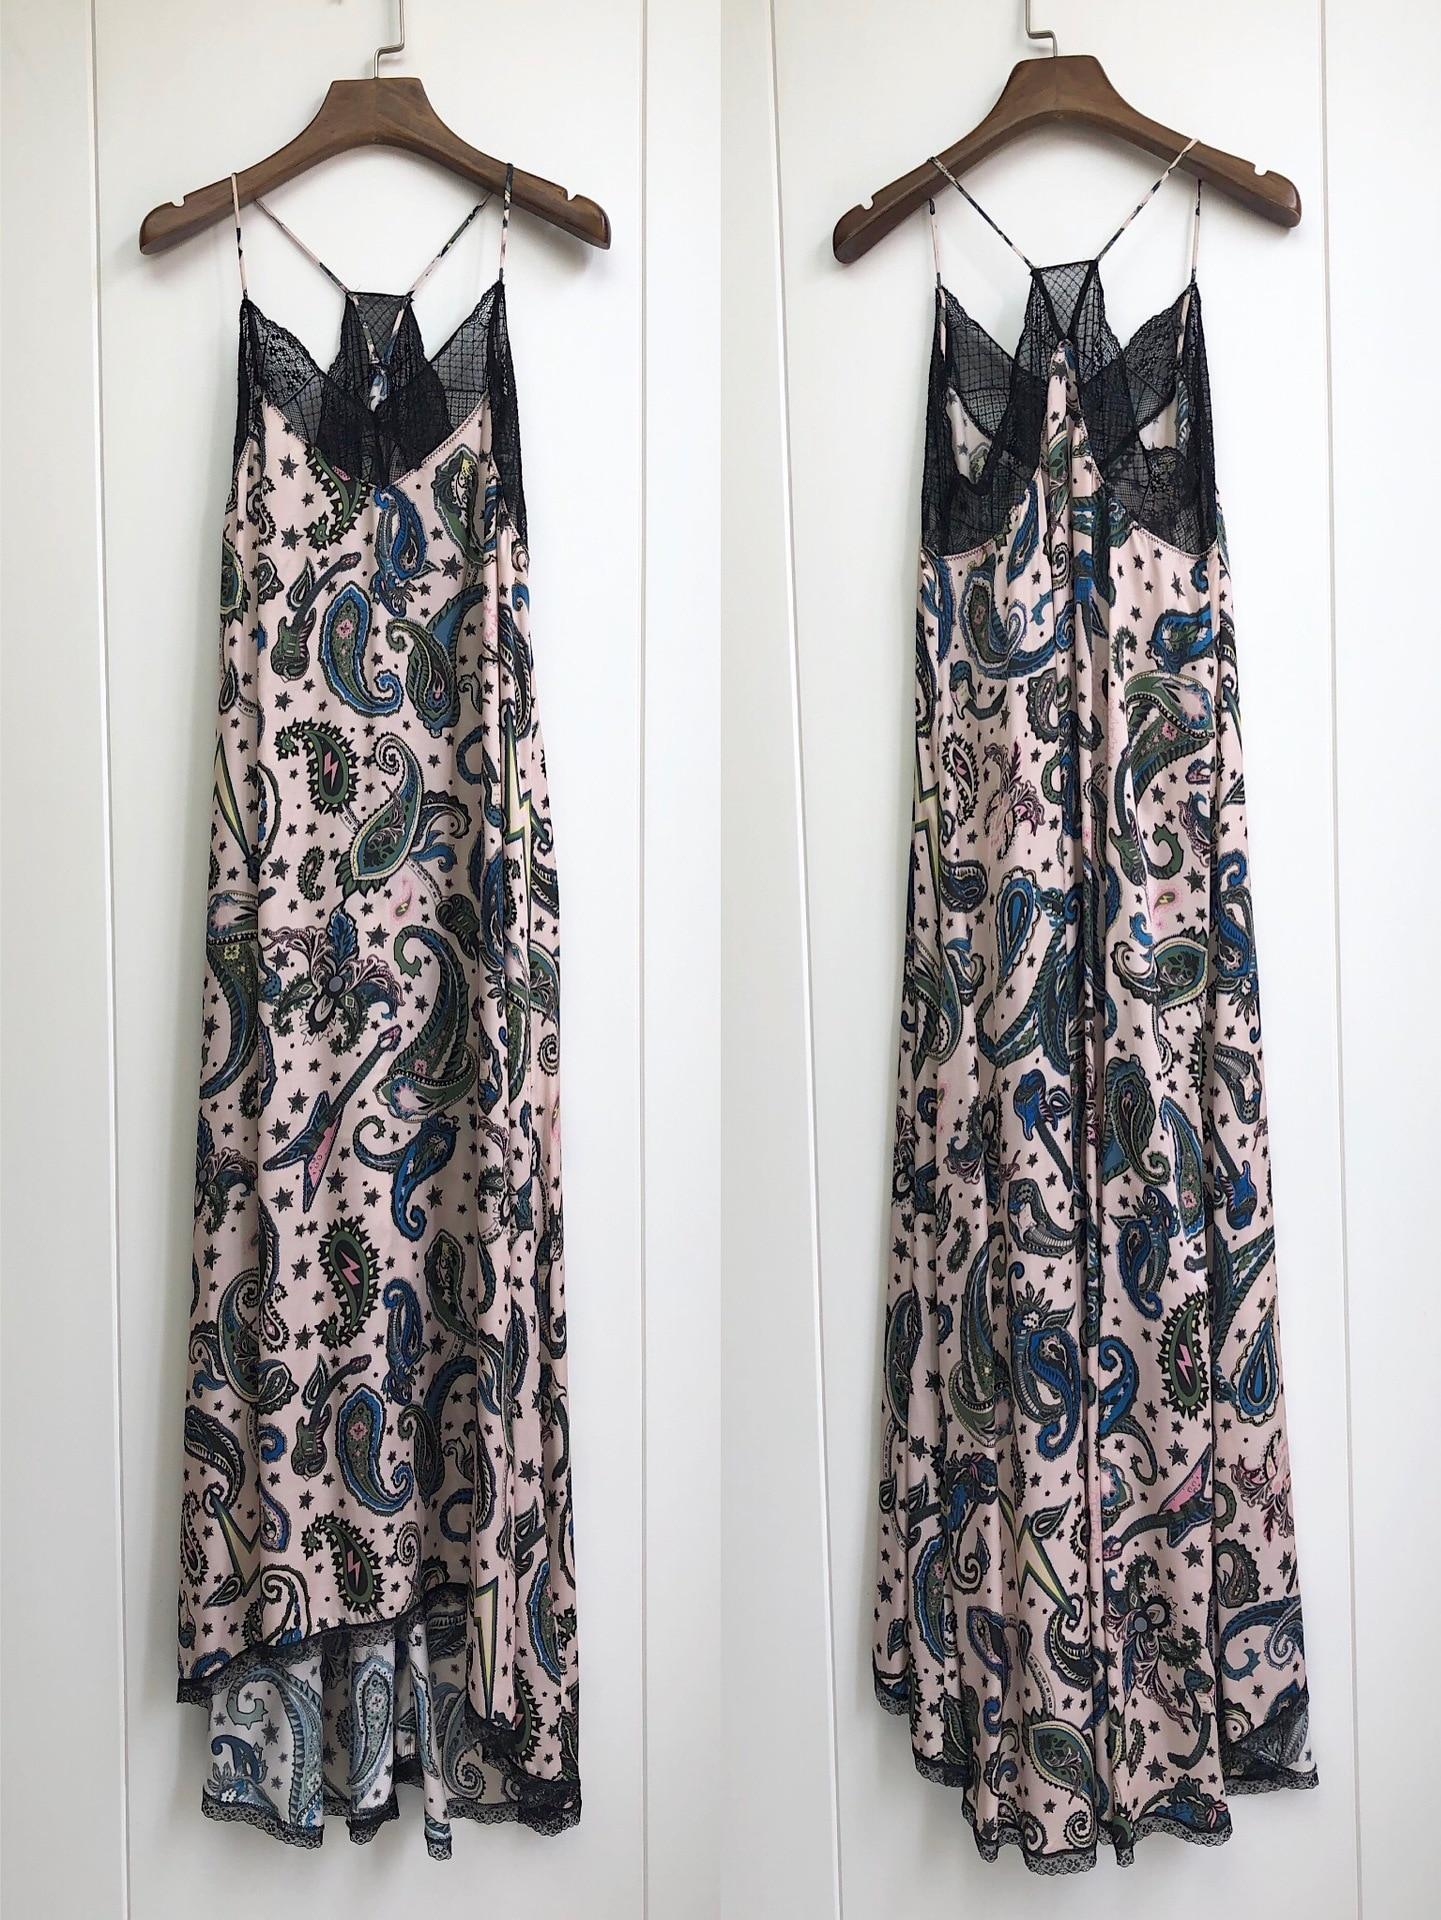 Women Dress 100% Viscose  Romantic Print Cashew Printed Halter Lace Midi DressDresses